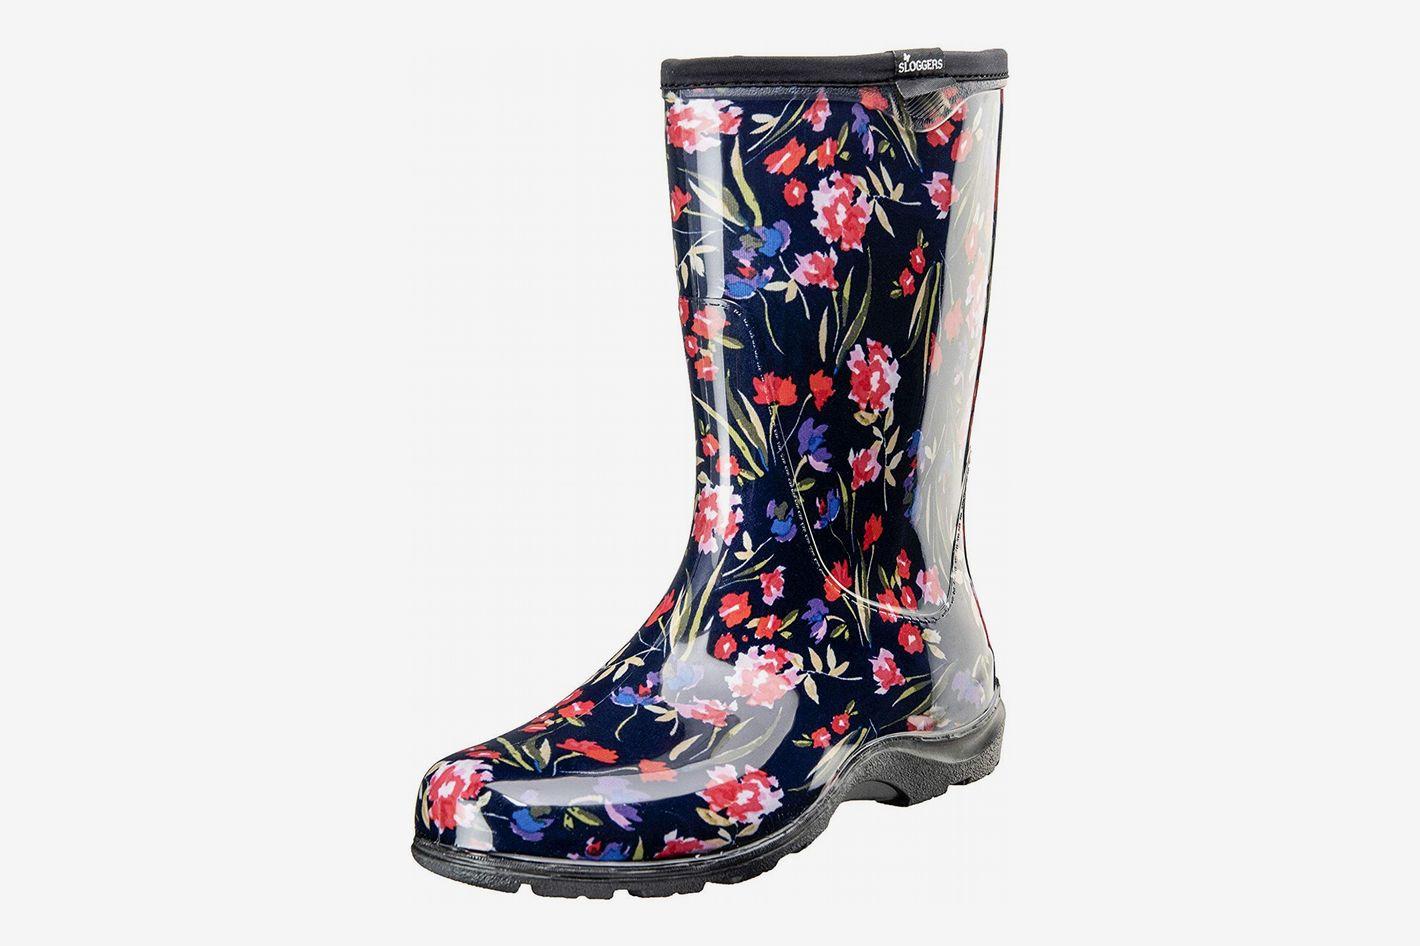 11 Best Rubber Boots For Women 2019